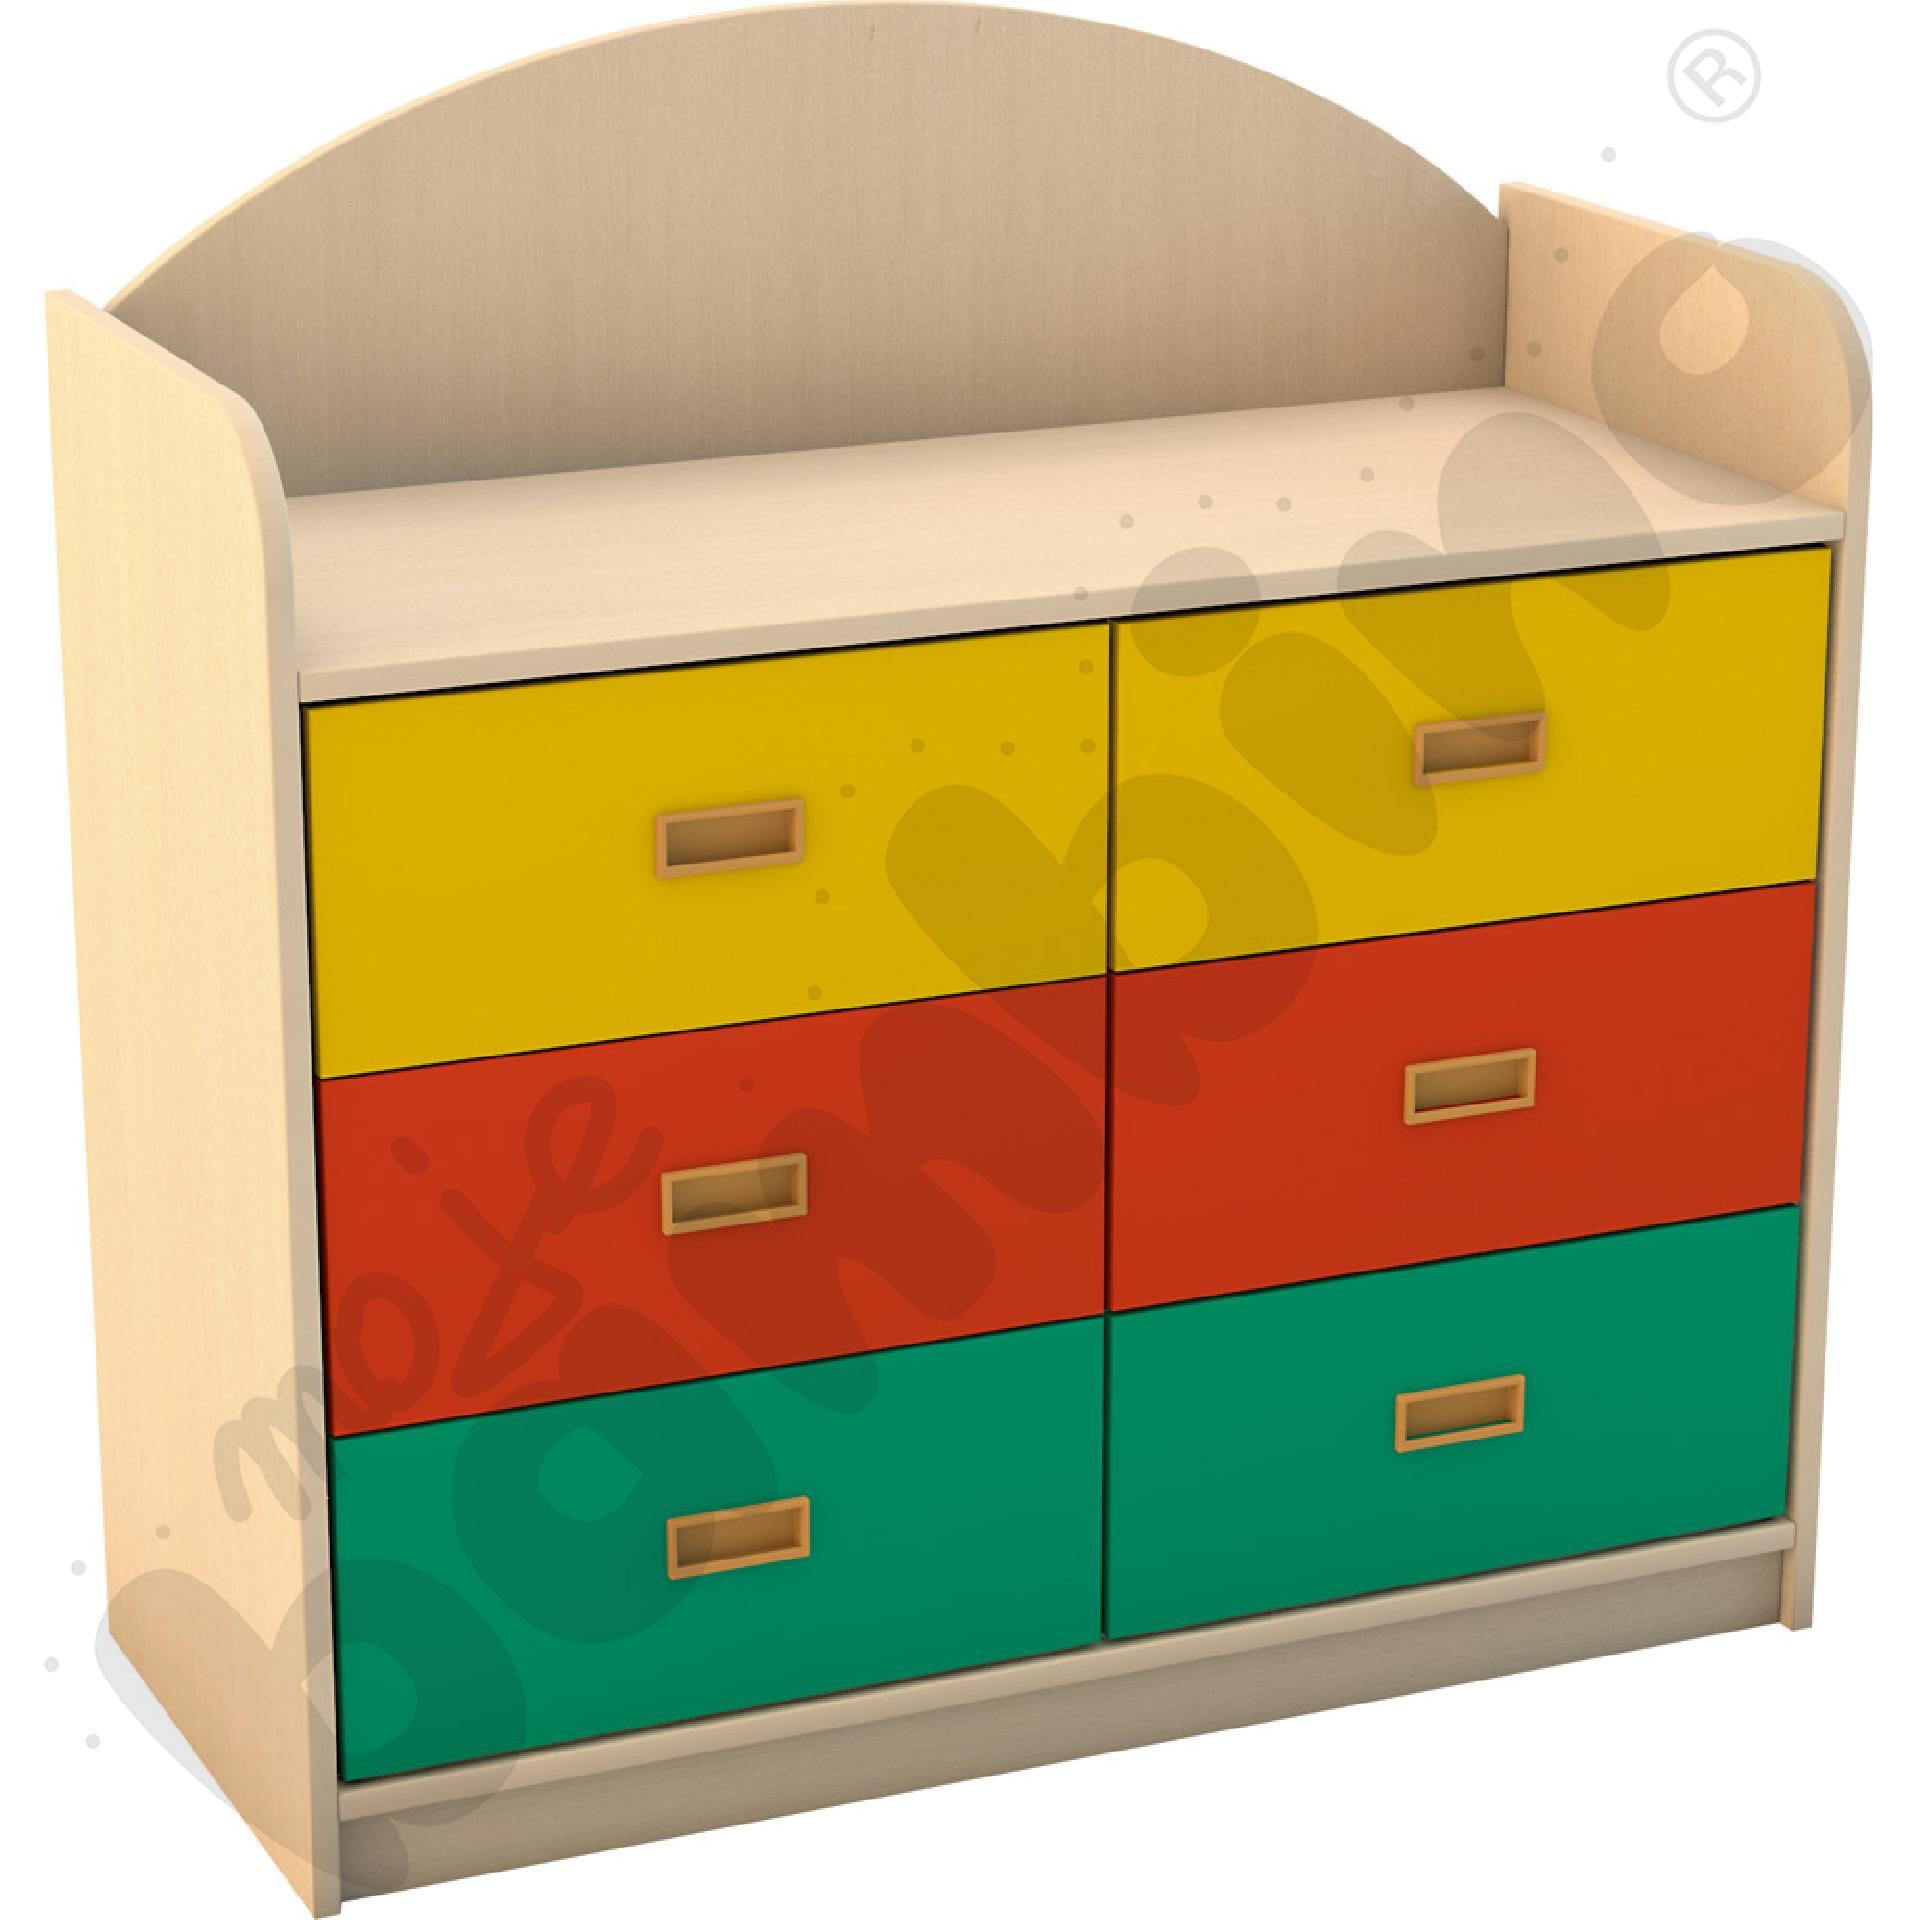 SANLANDIA komoda z 6 szufladami